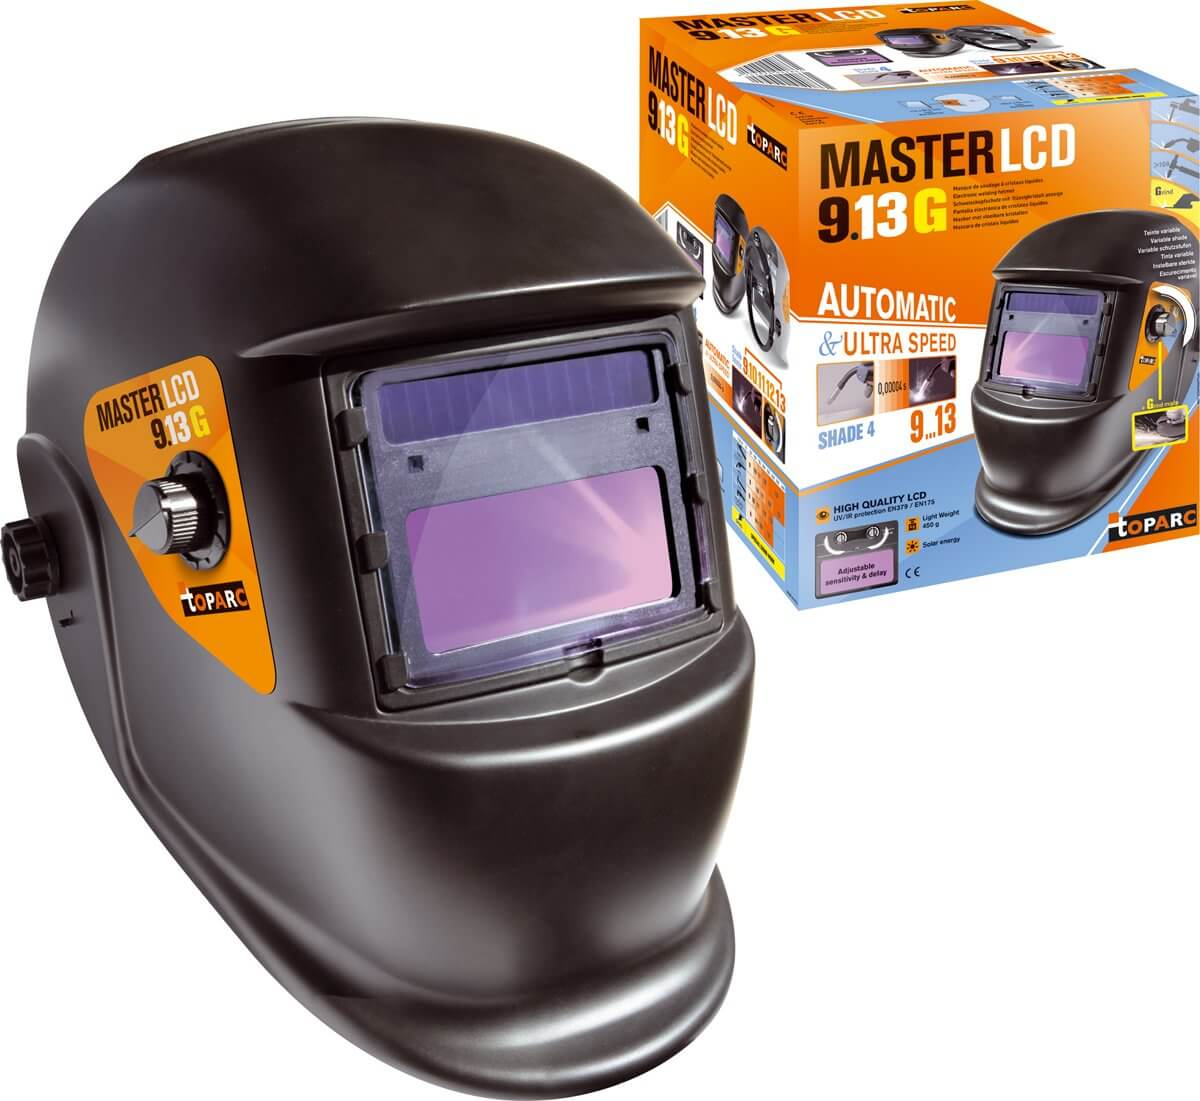 Masque de soudeur MASTER LCD 9-13G - TOPARC